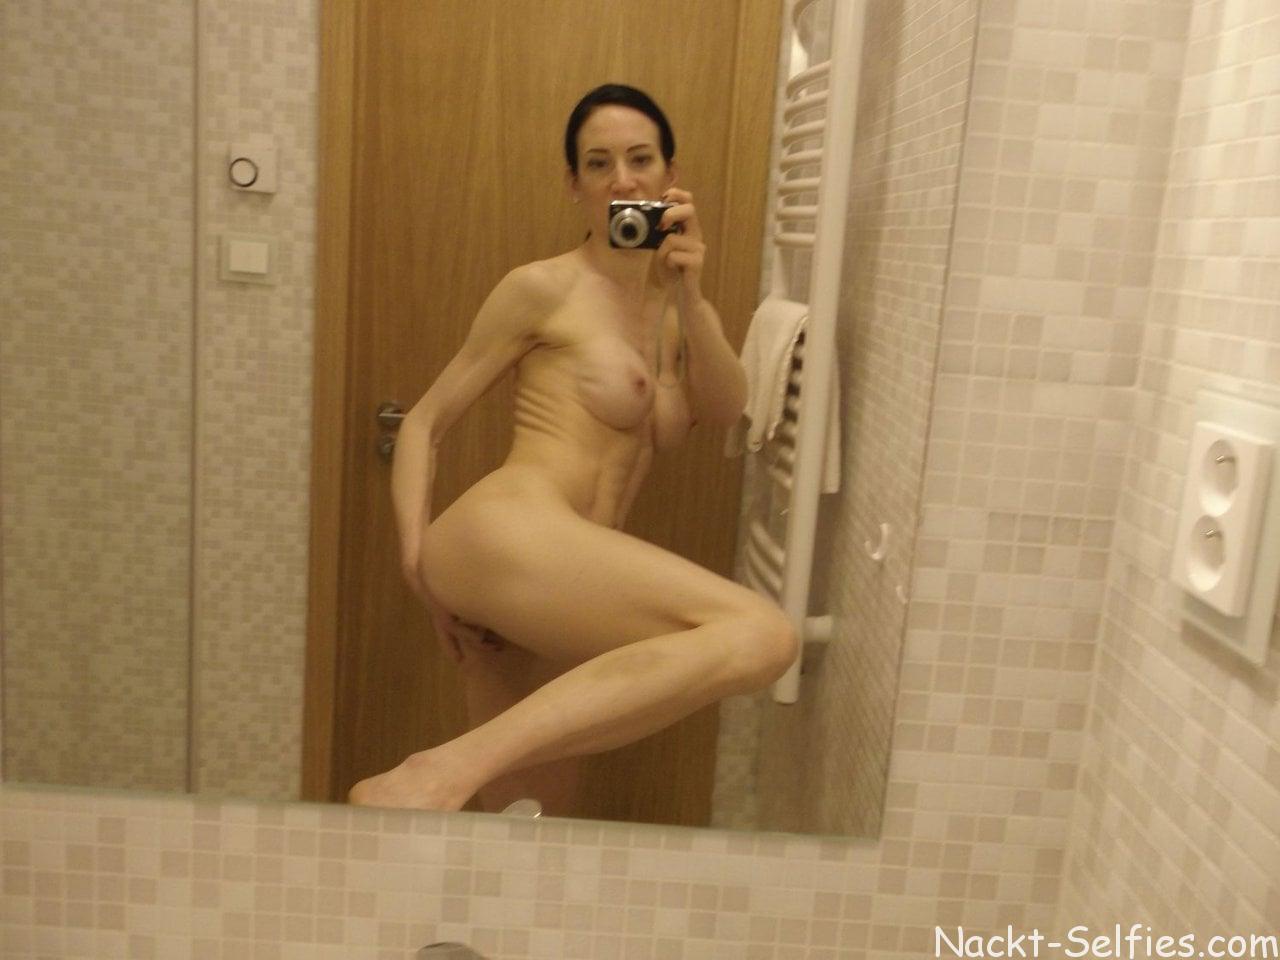 Amateur Nackt Selfie Alissa 06